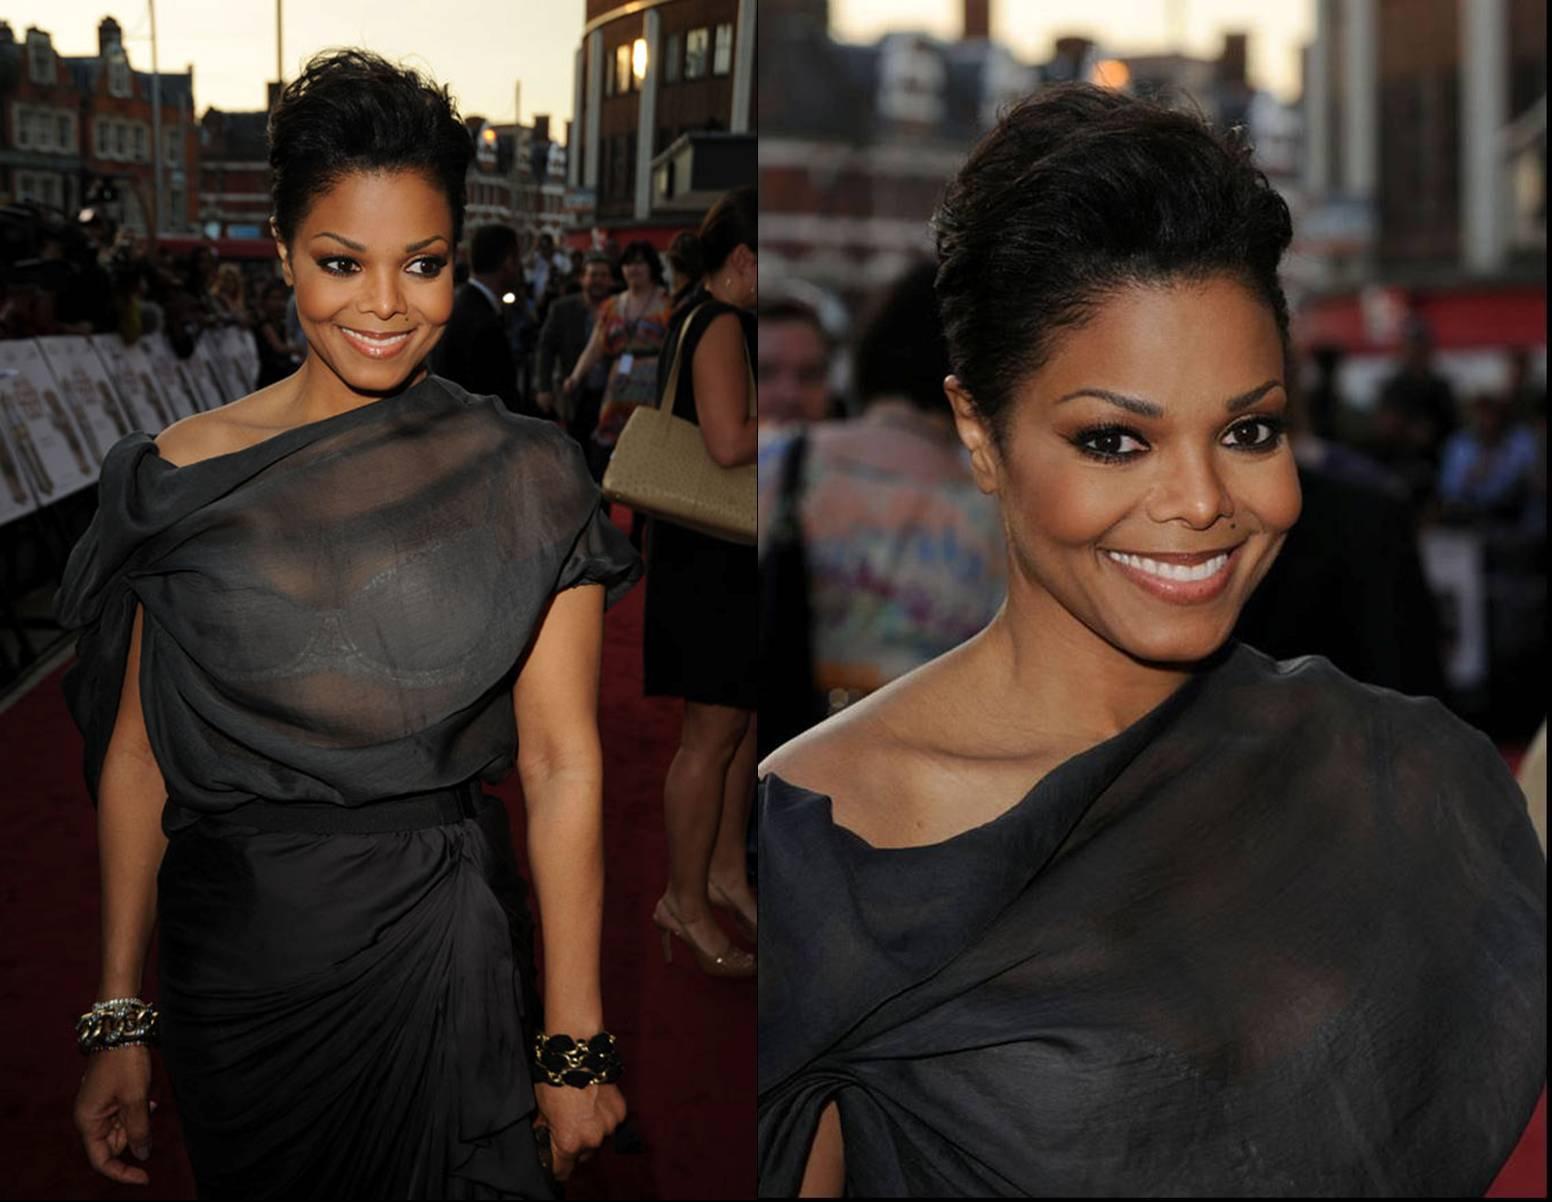 http://4.bp.blogspot.com/_W6NKM9wLprM/S_nio59p2YI/AAAAAAAADCQ/RHVhFC56PJY/s1600/Janets+new+cut+and+silver+dress.jpg